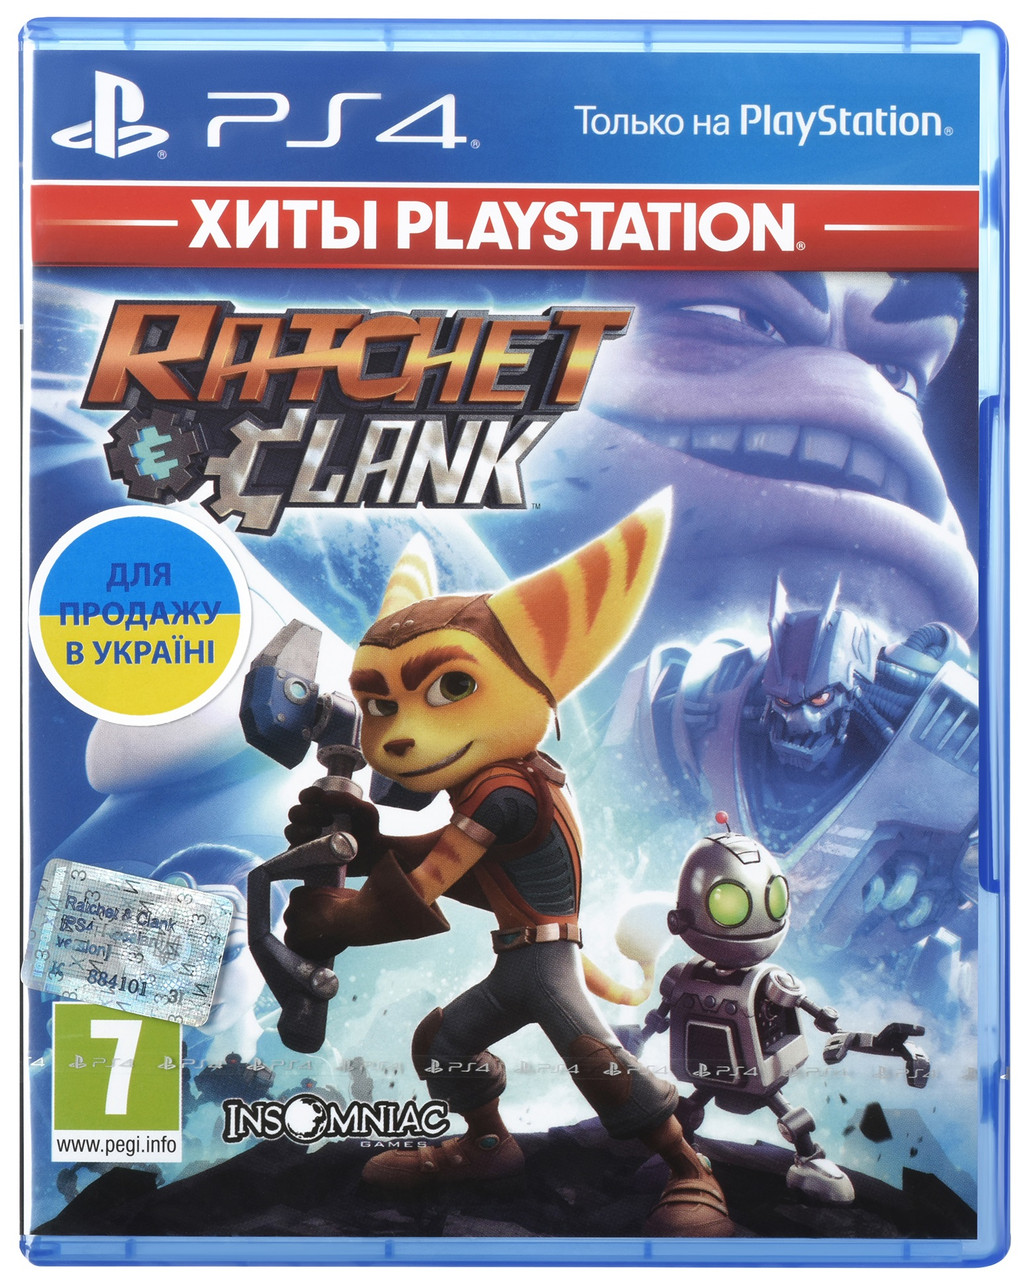 Гра Ratchet & Clank (PlayStation)